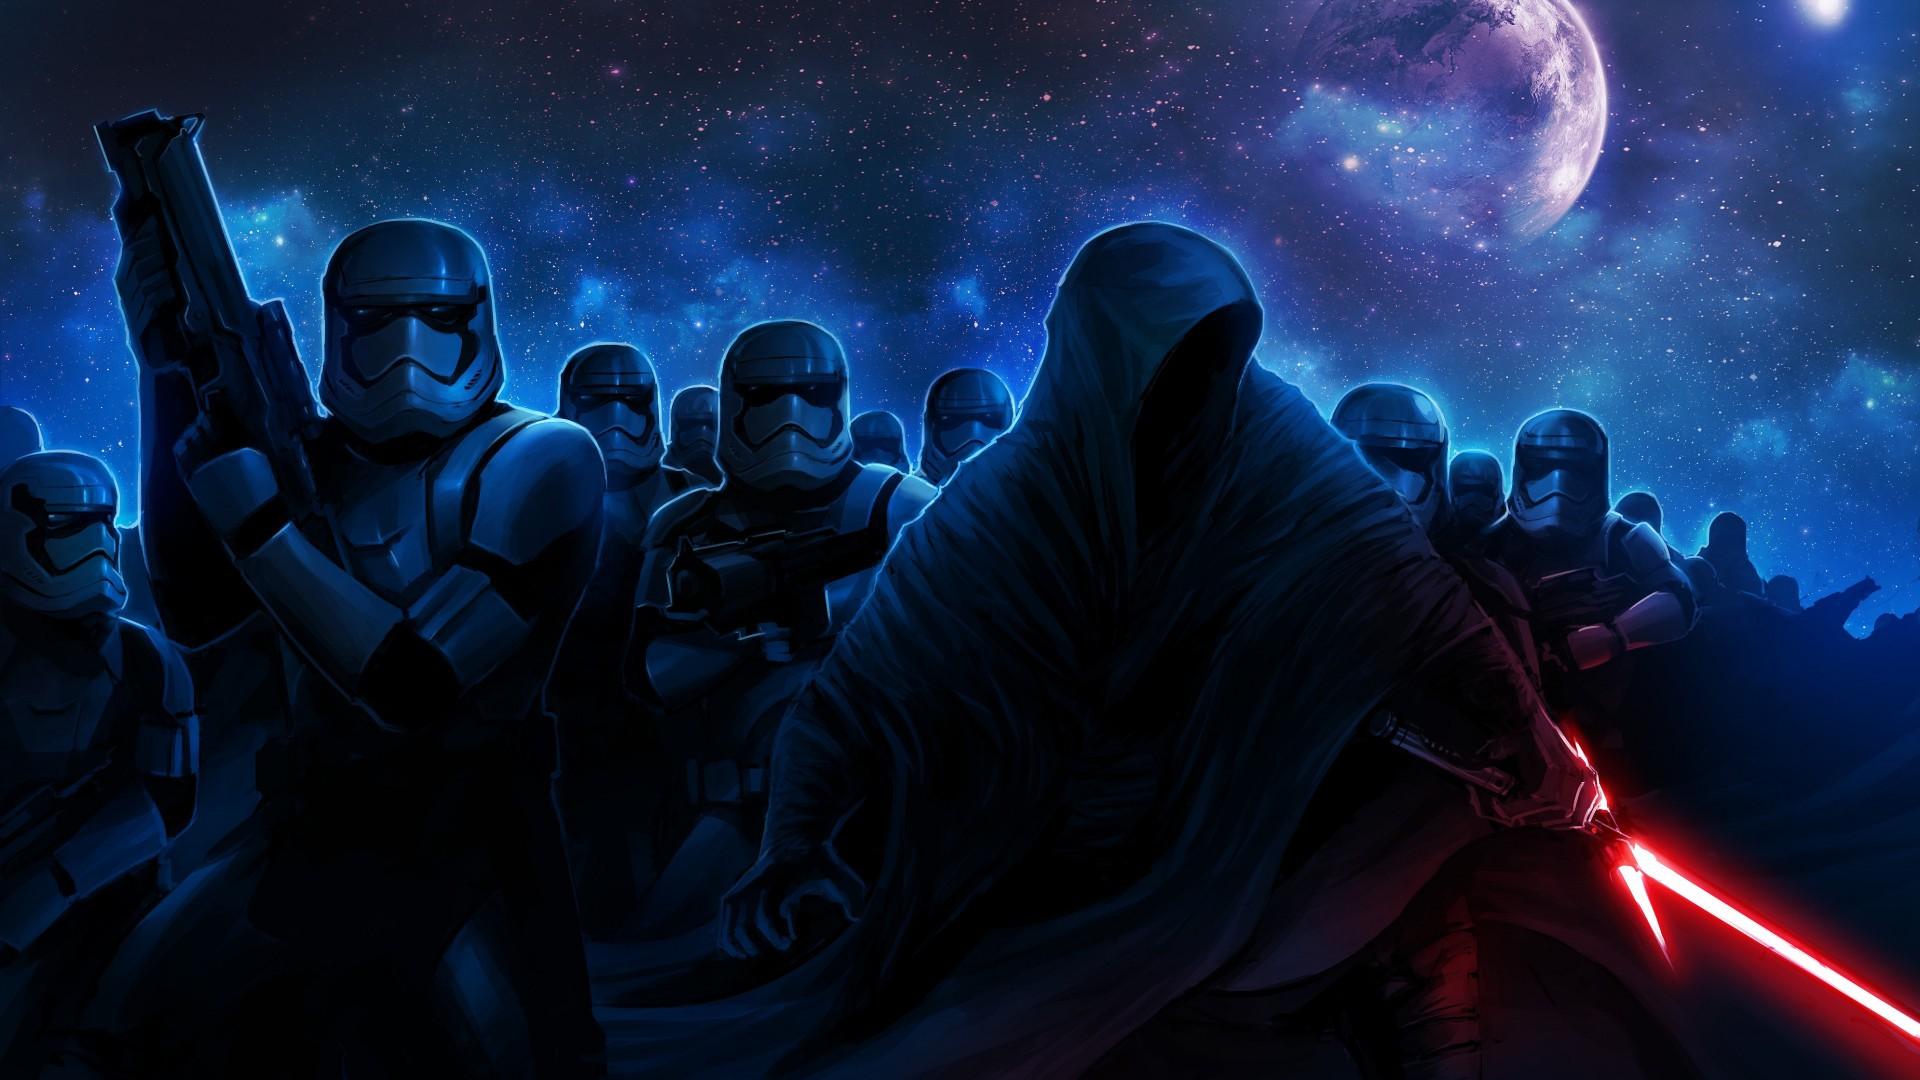 Star Wars Episode 7 The Force Awakens   Destroyed Star Destroyer 1920x1080